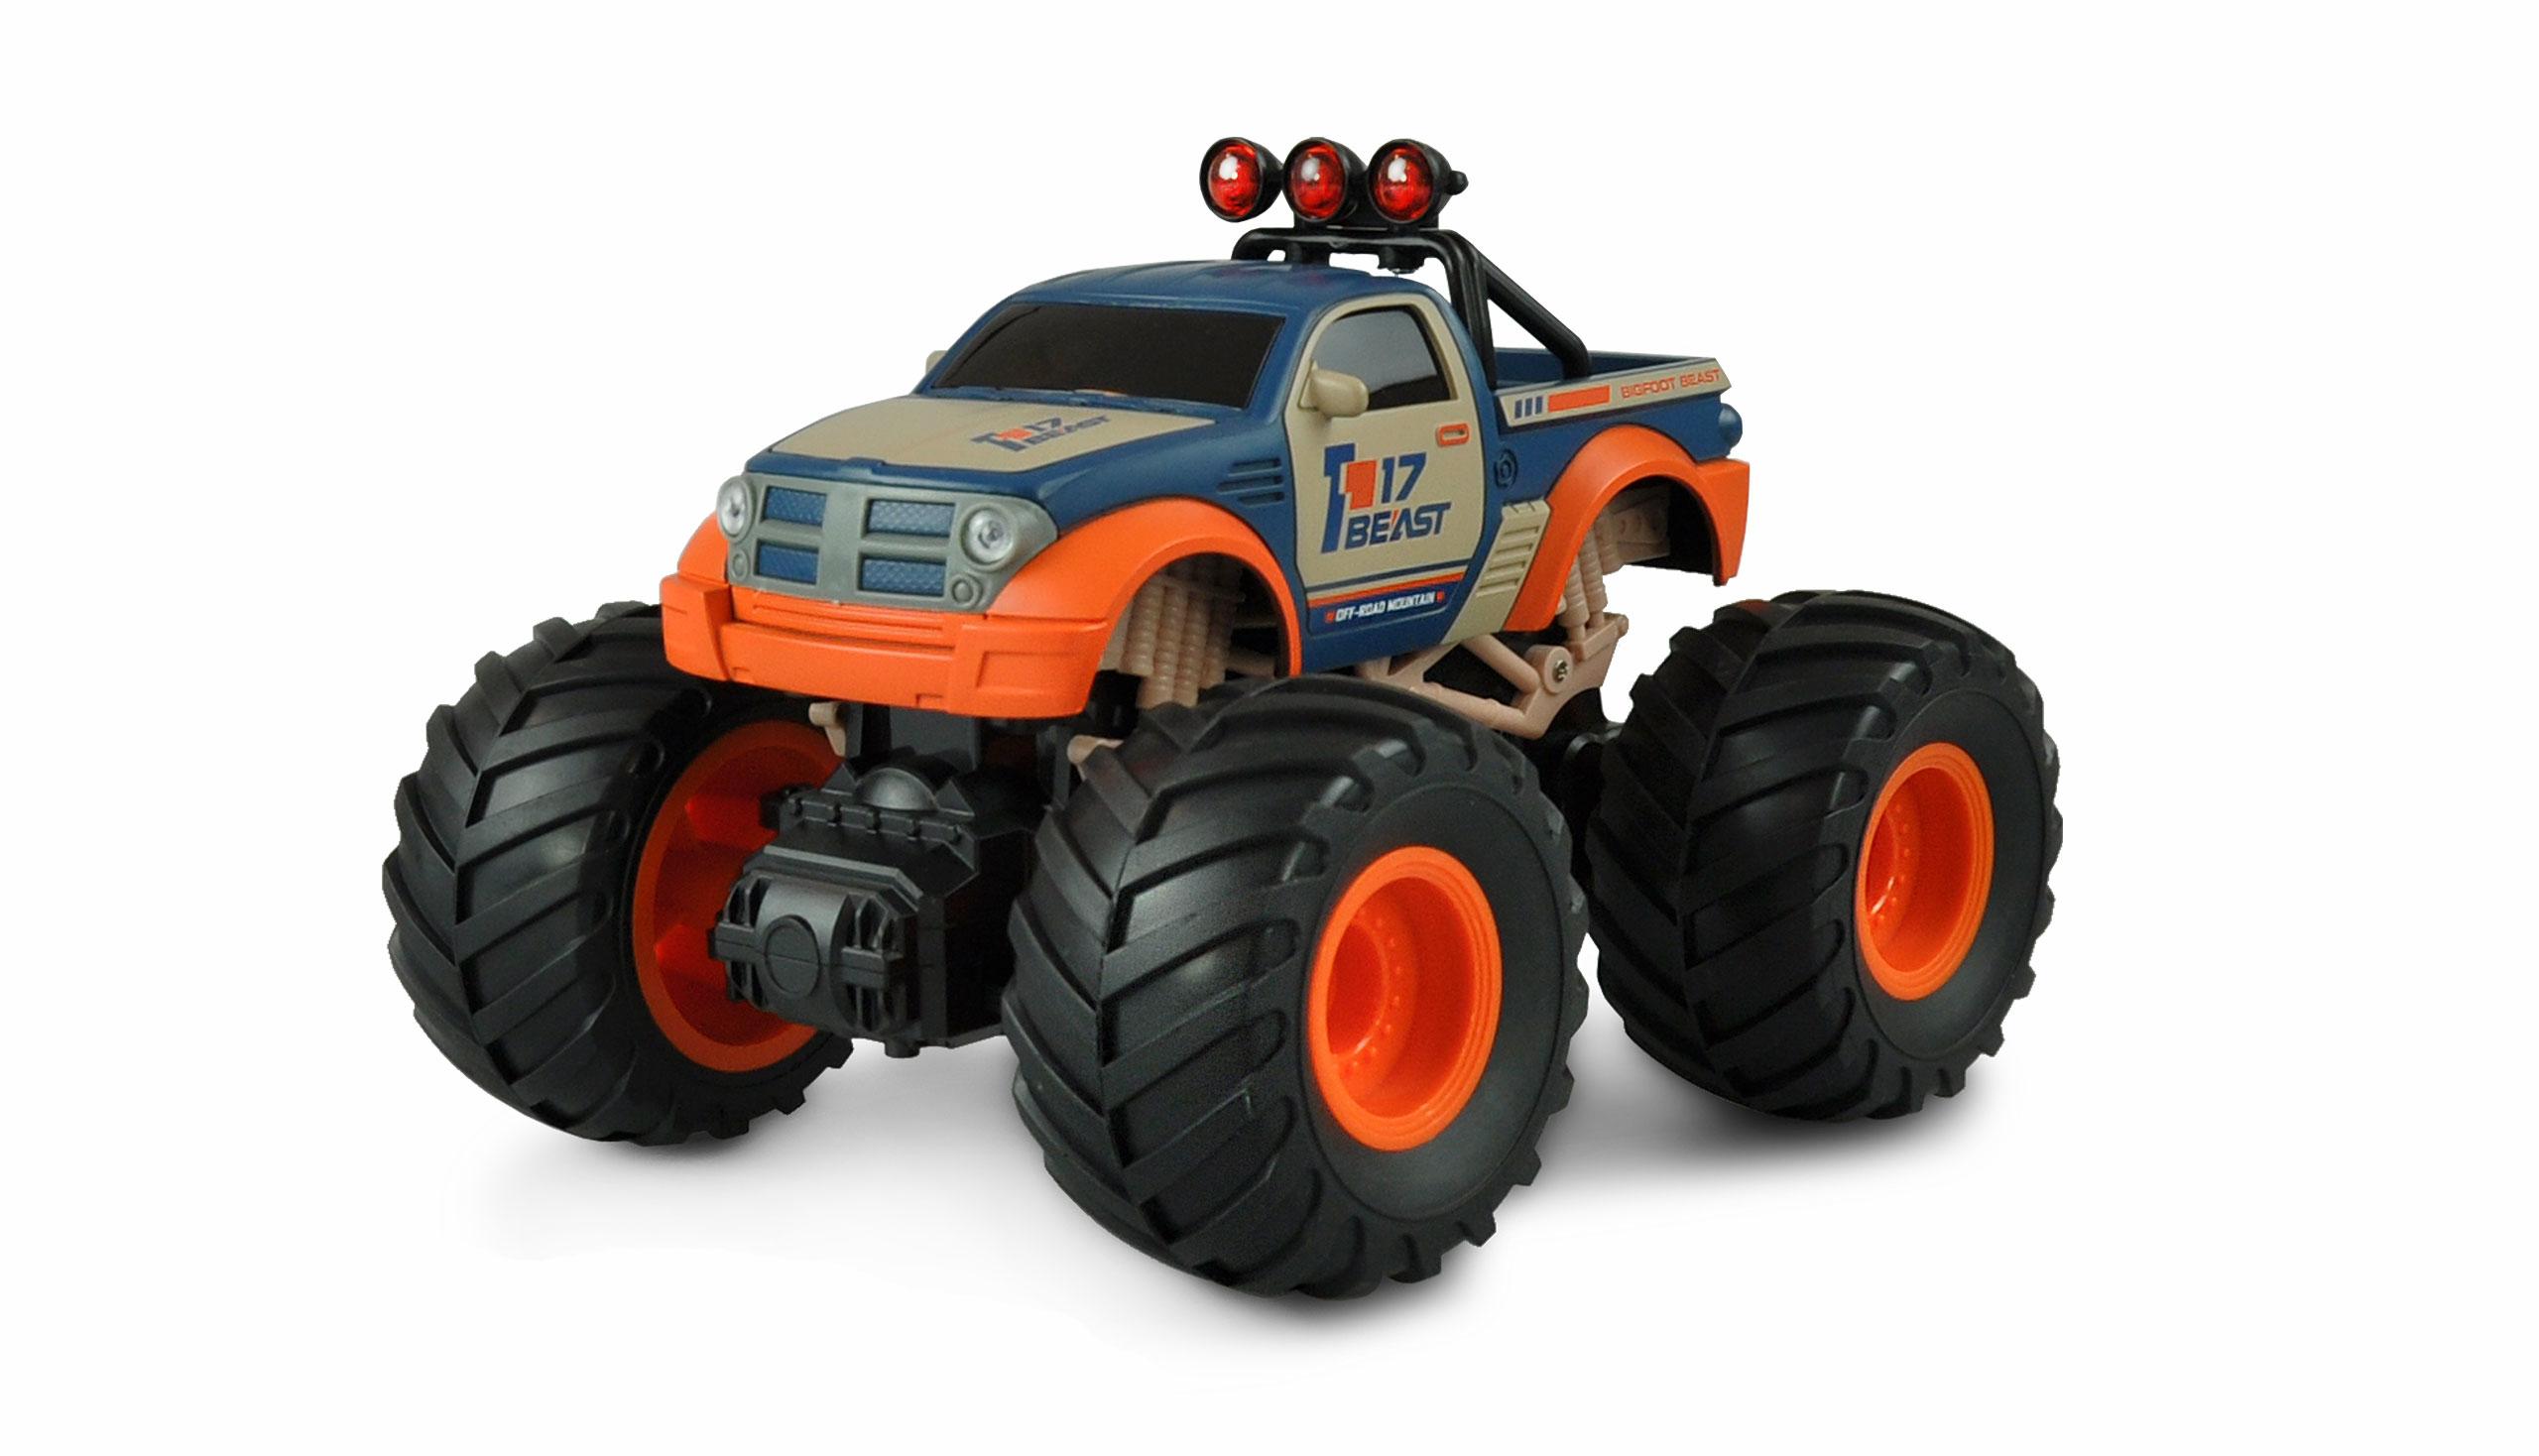 Amewi 22483 - Buggy - Elektromotor - 1:18 - Betriebsbereit (RTR) - Blau - Orange - Junge/Mädchen